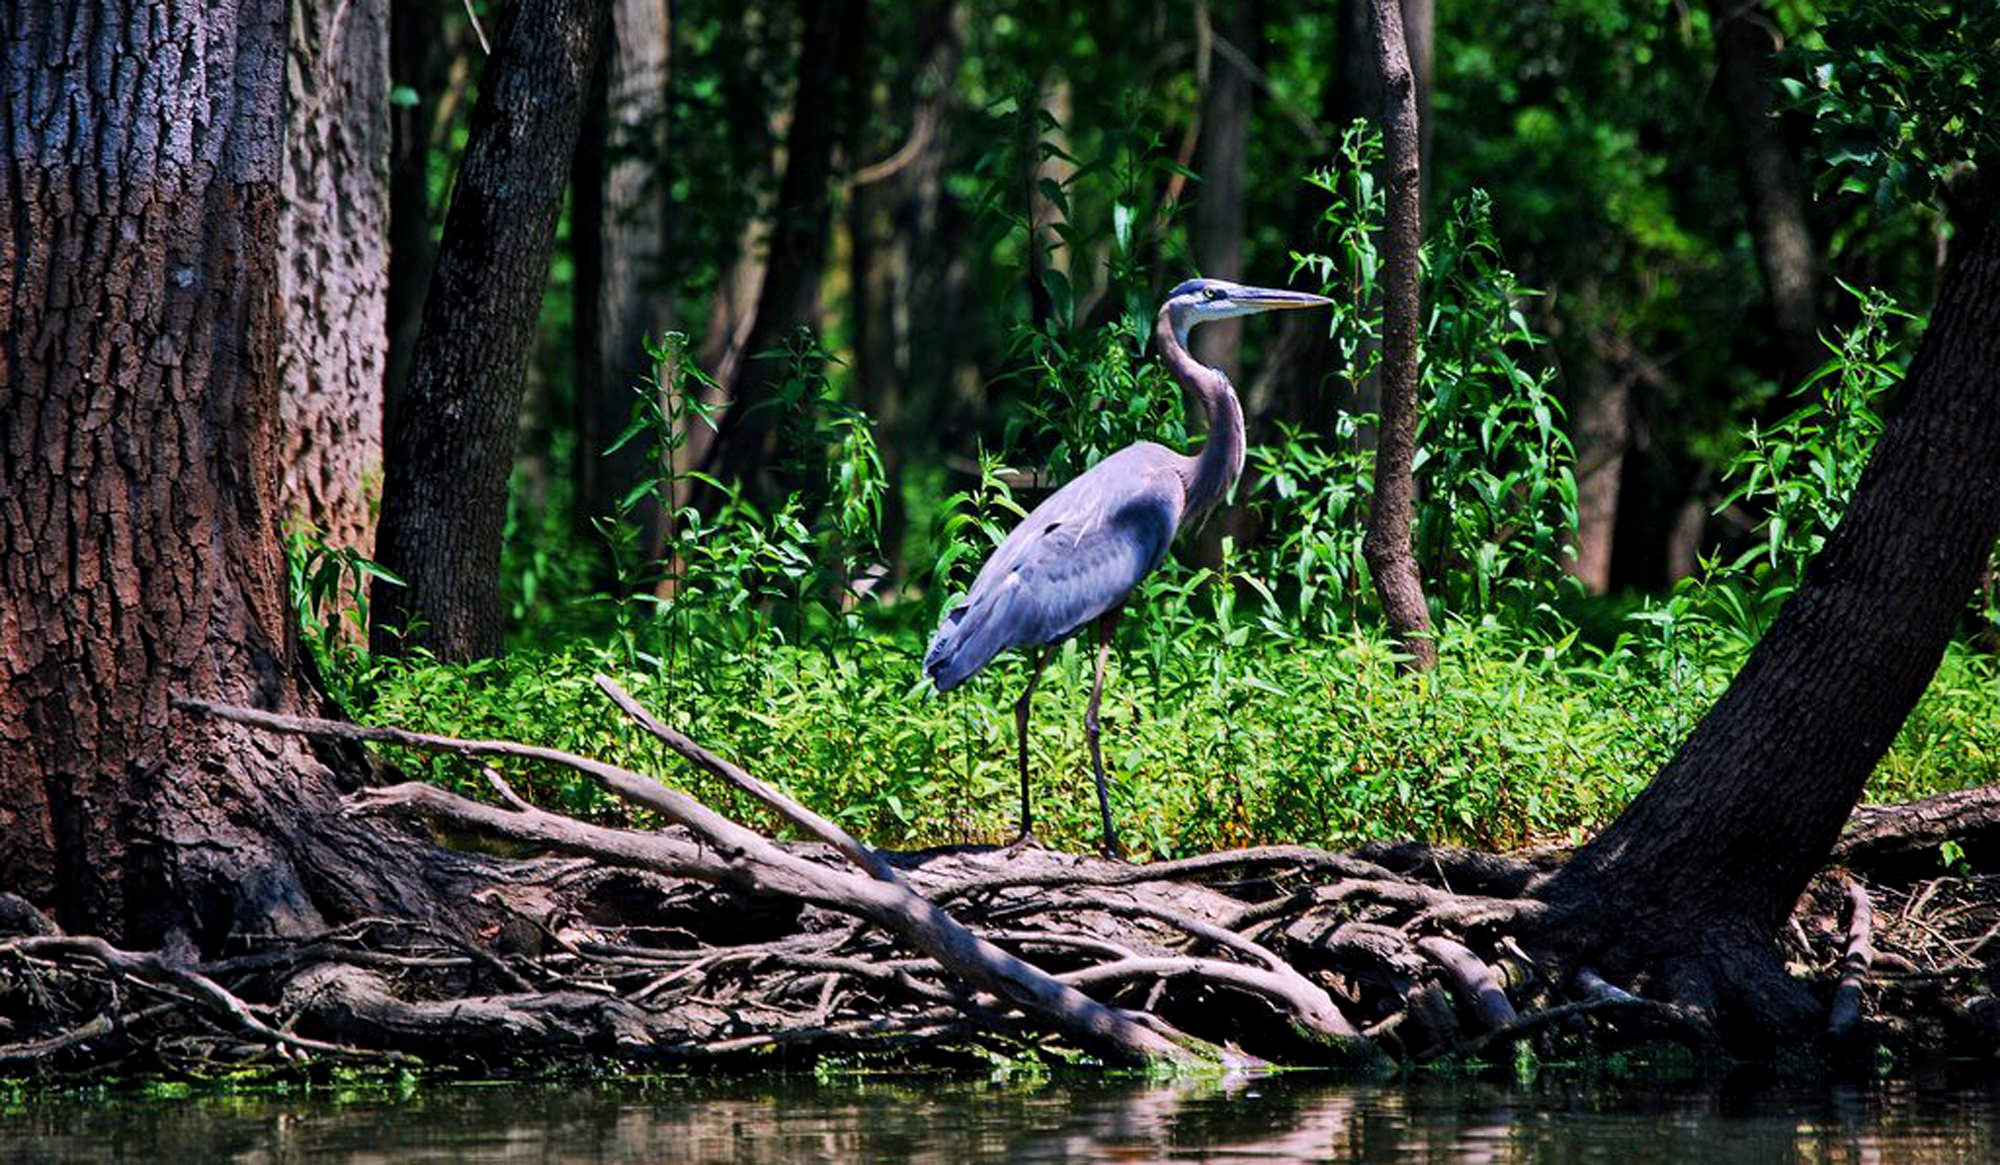 Skokie_Lagoon_Blue_Heron_2000_x_1165